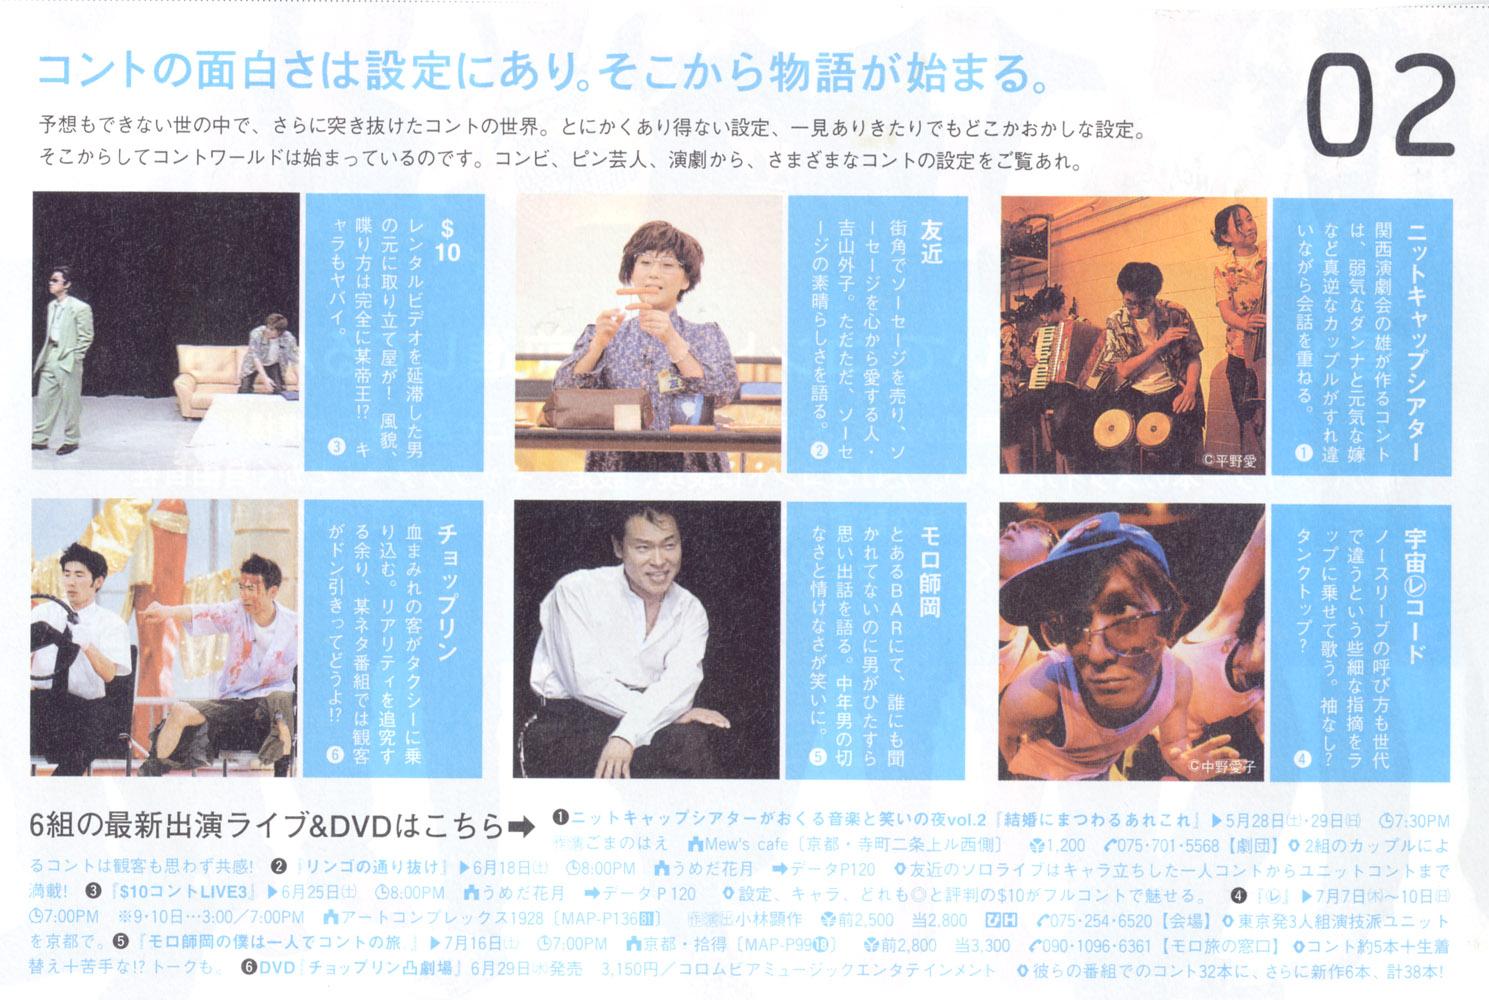 20061119-20050701lmagazine.jpg